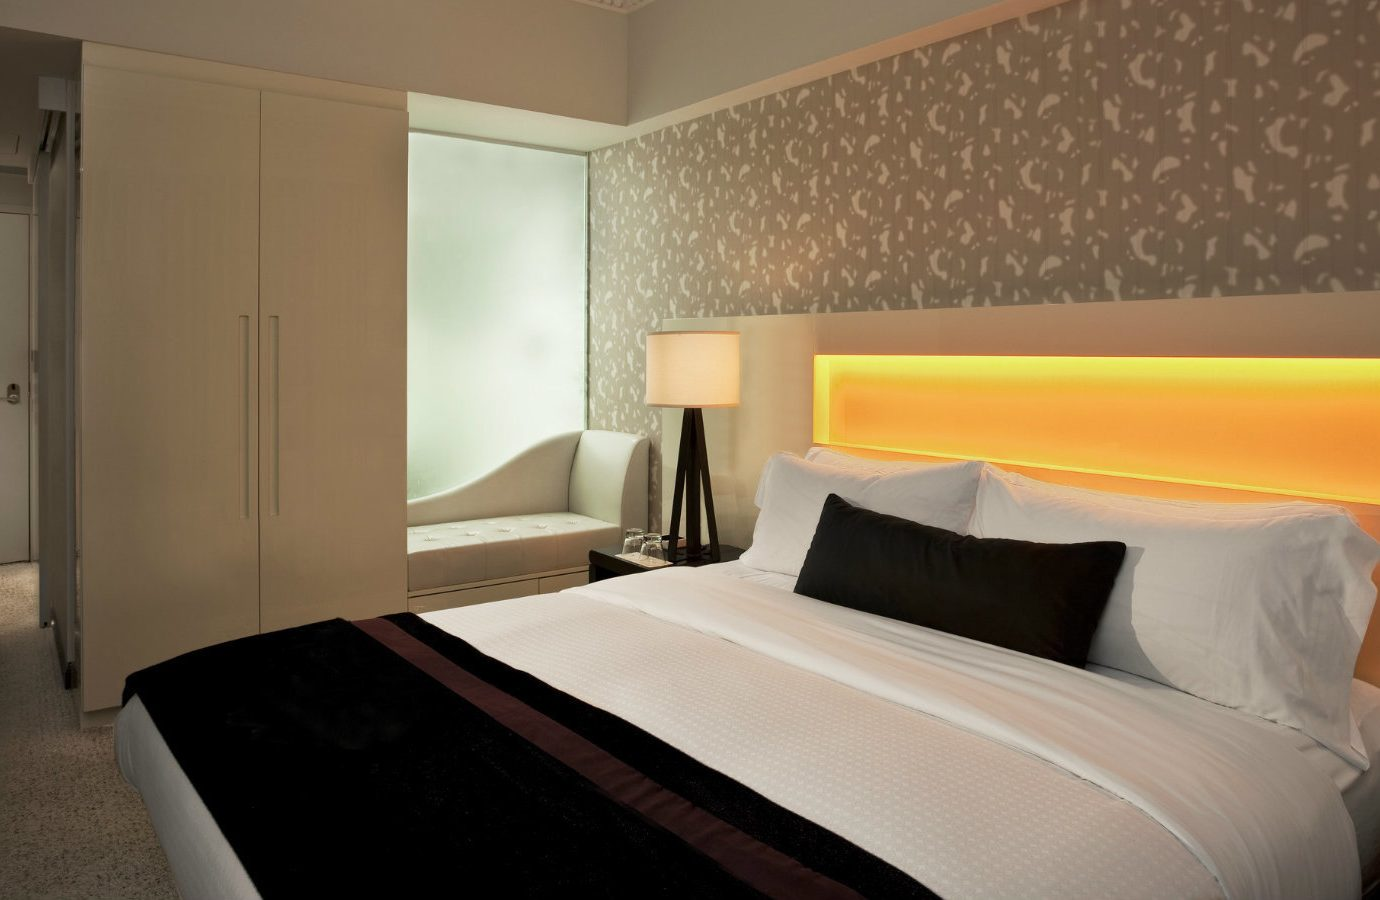 Hotels bed indoor wall hotel room Bedroom floor Suite interior design ceiling bed frame pillow real estate comfort interior designer bed sheet